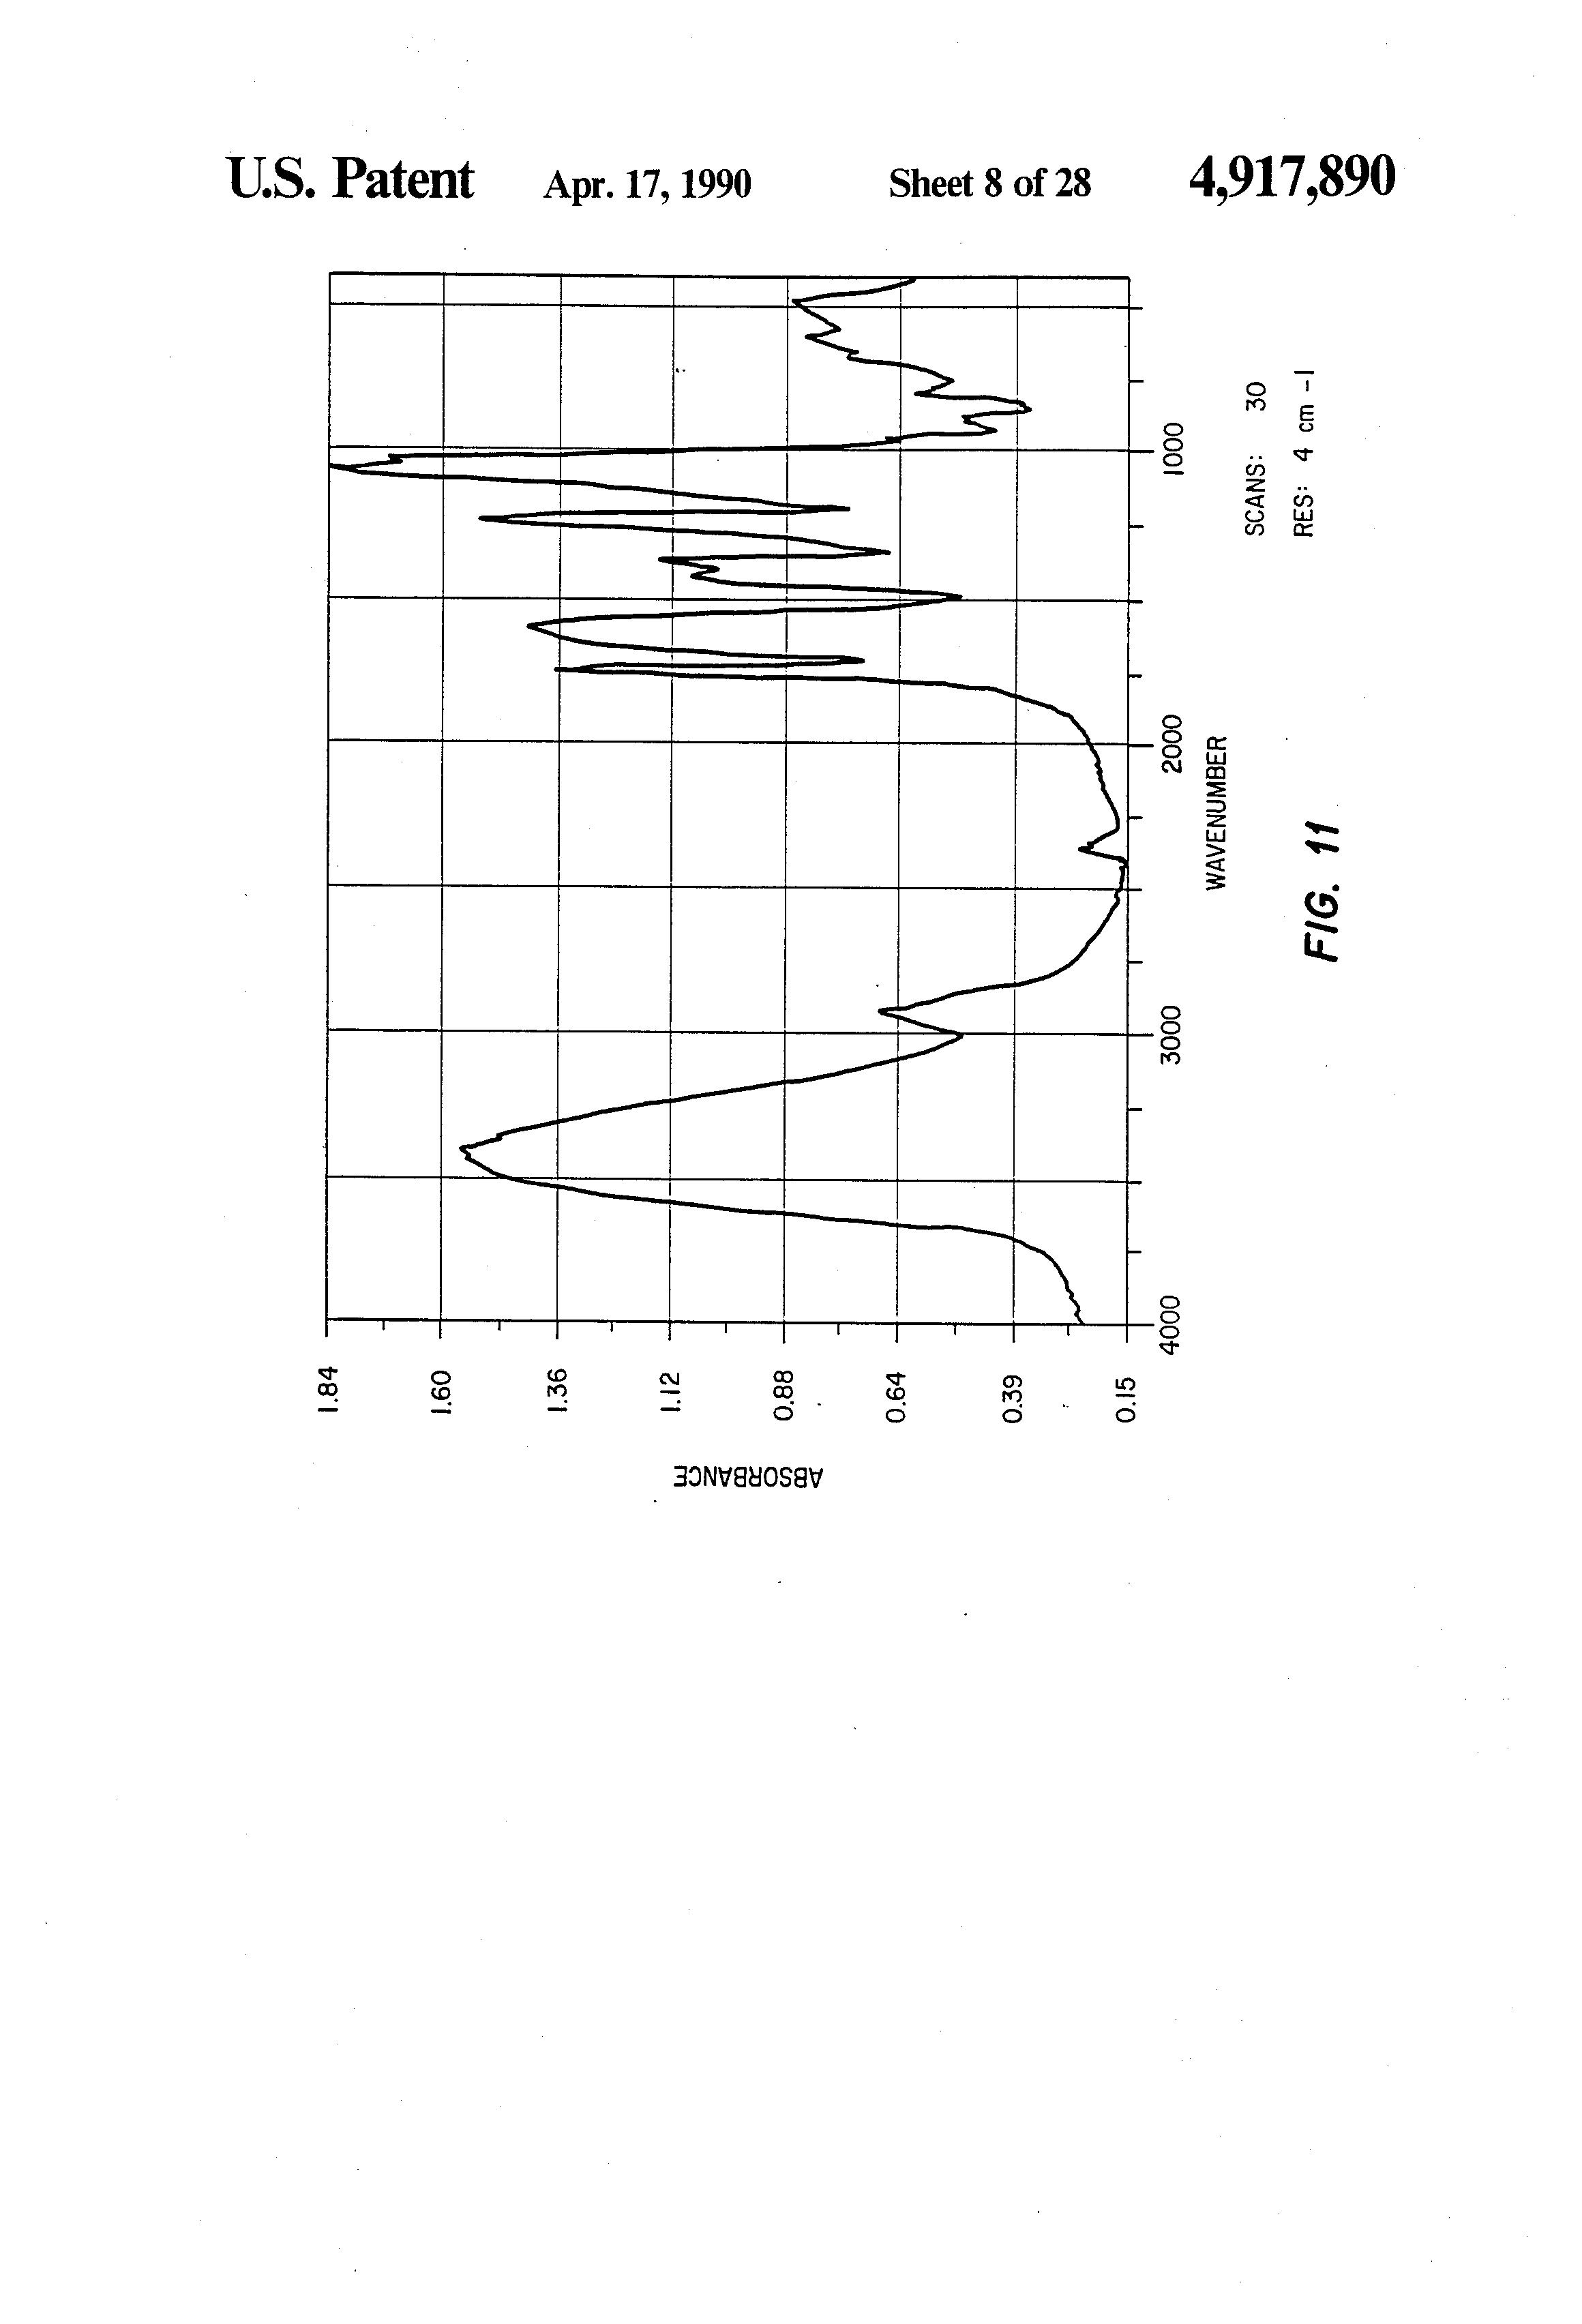 /PH 1 System 4//269/12/Phillips Combo Blade PH 0/